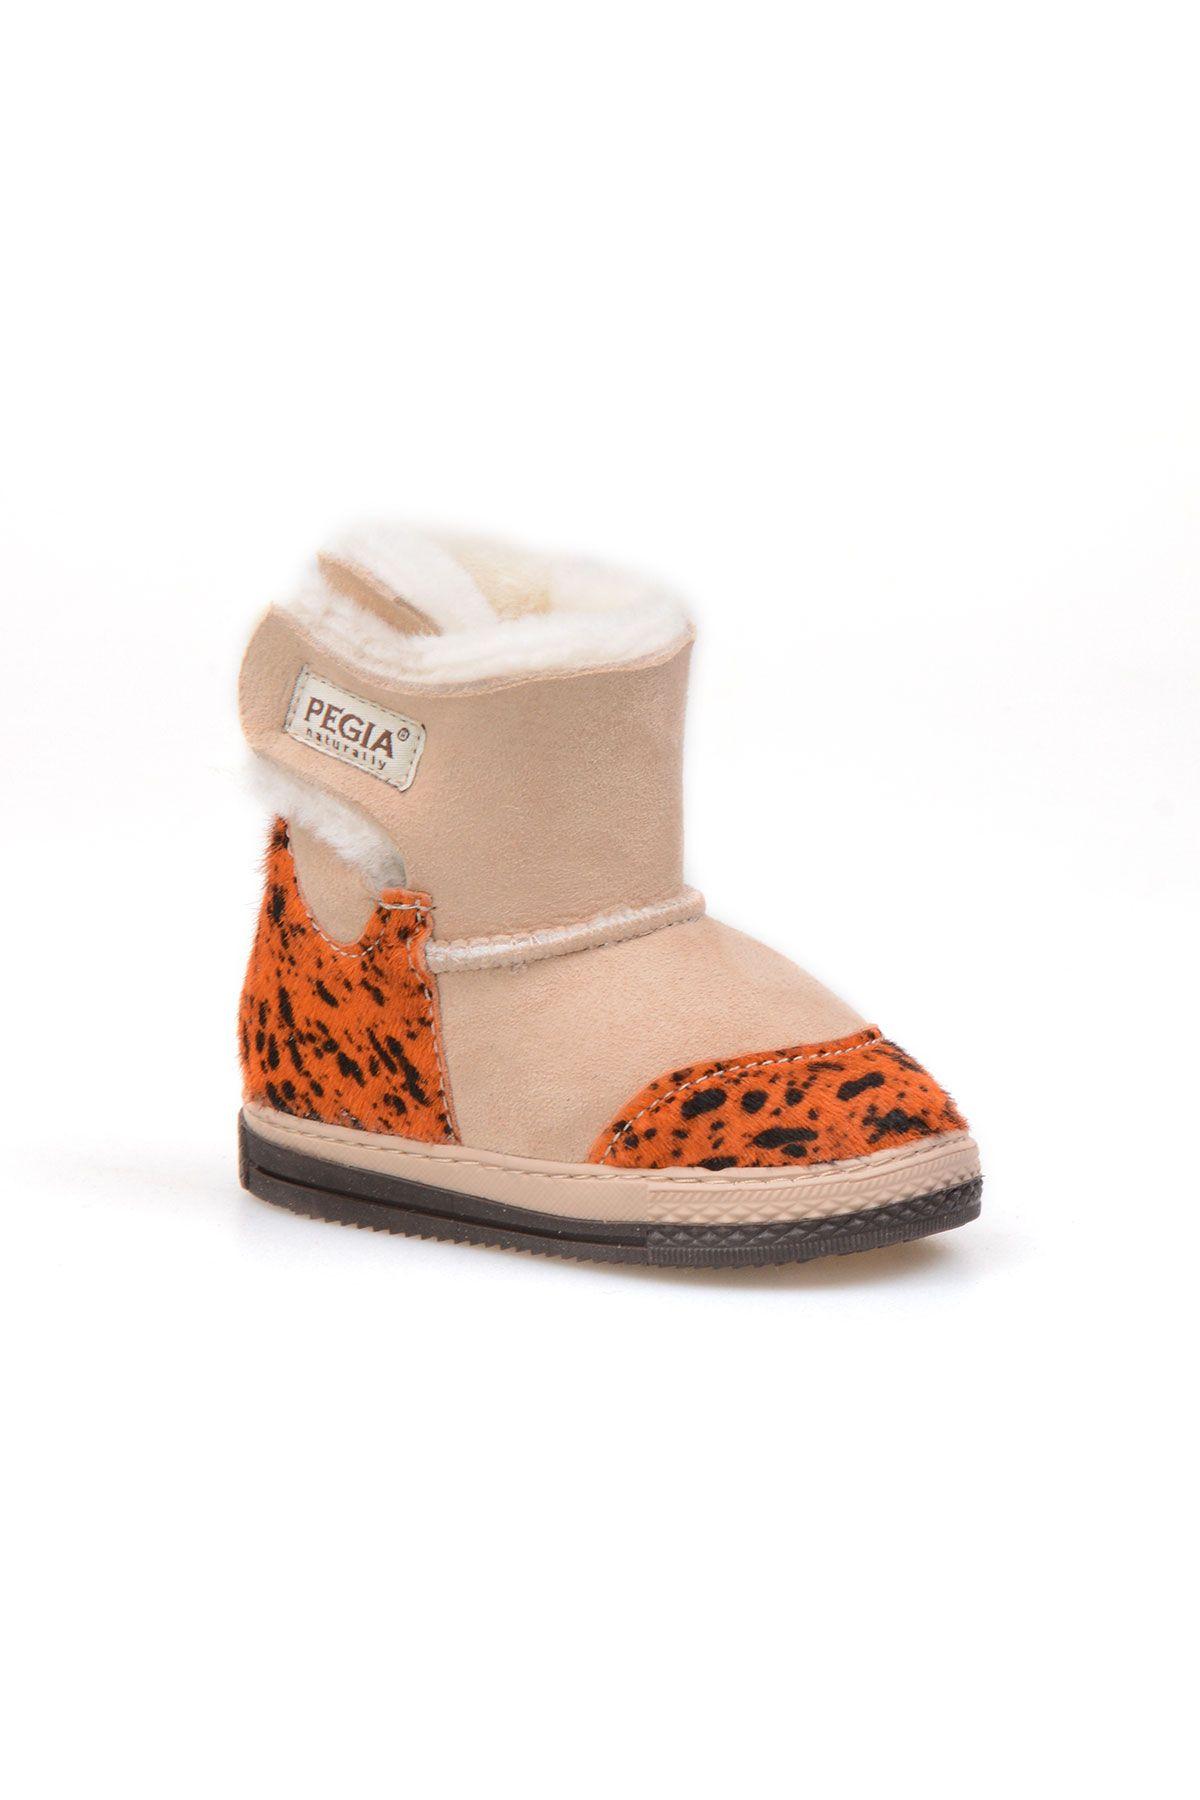 Pegia Genuine Suede Sheepskin Lined Velcro Kid's Boots 186014 Orange